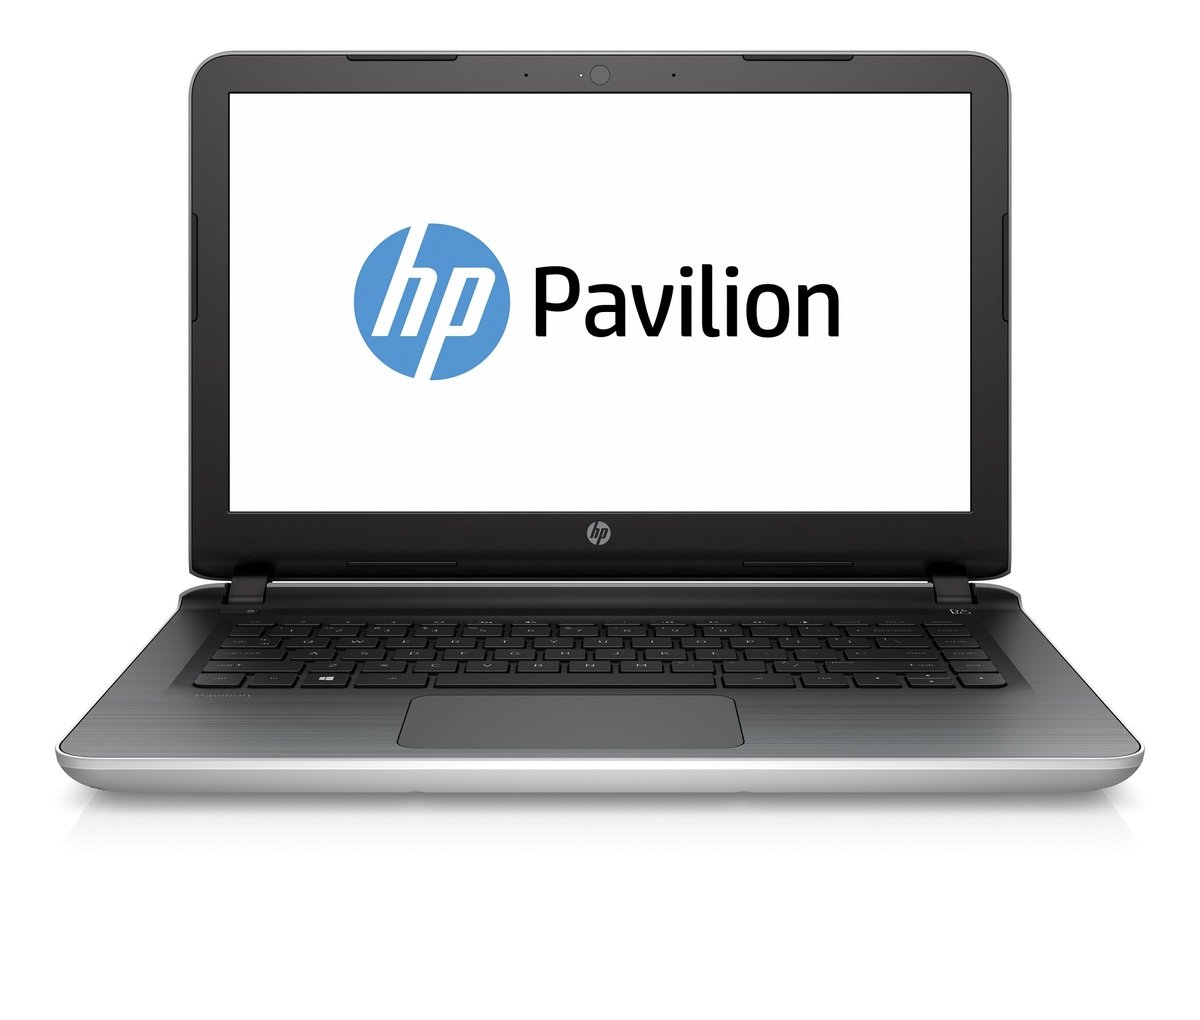 Pavilion 14-ab122TU 筆記簿型電腦